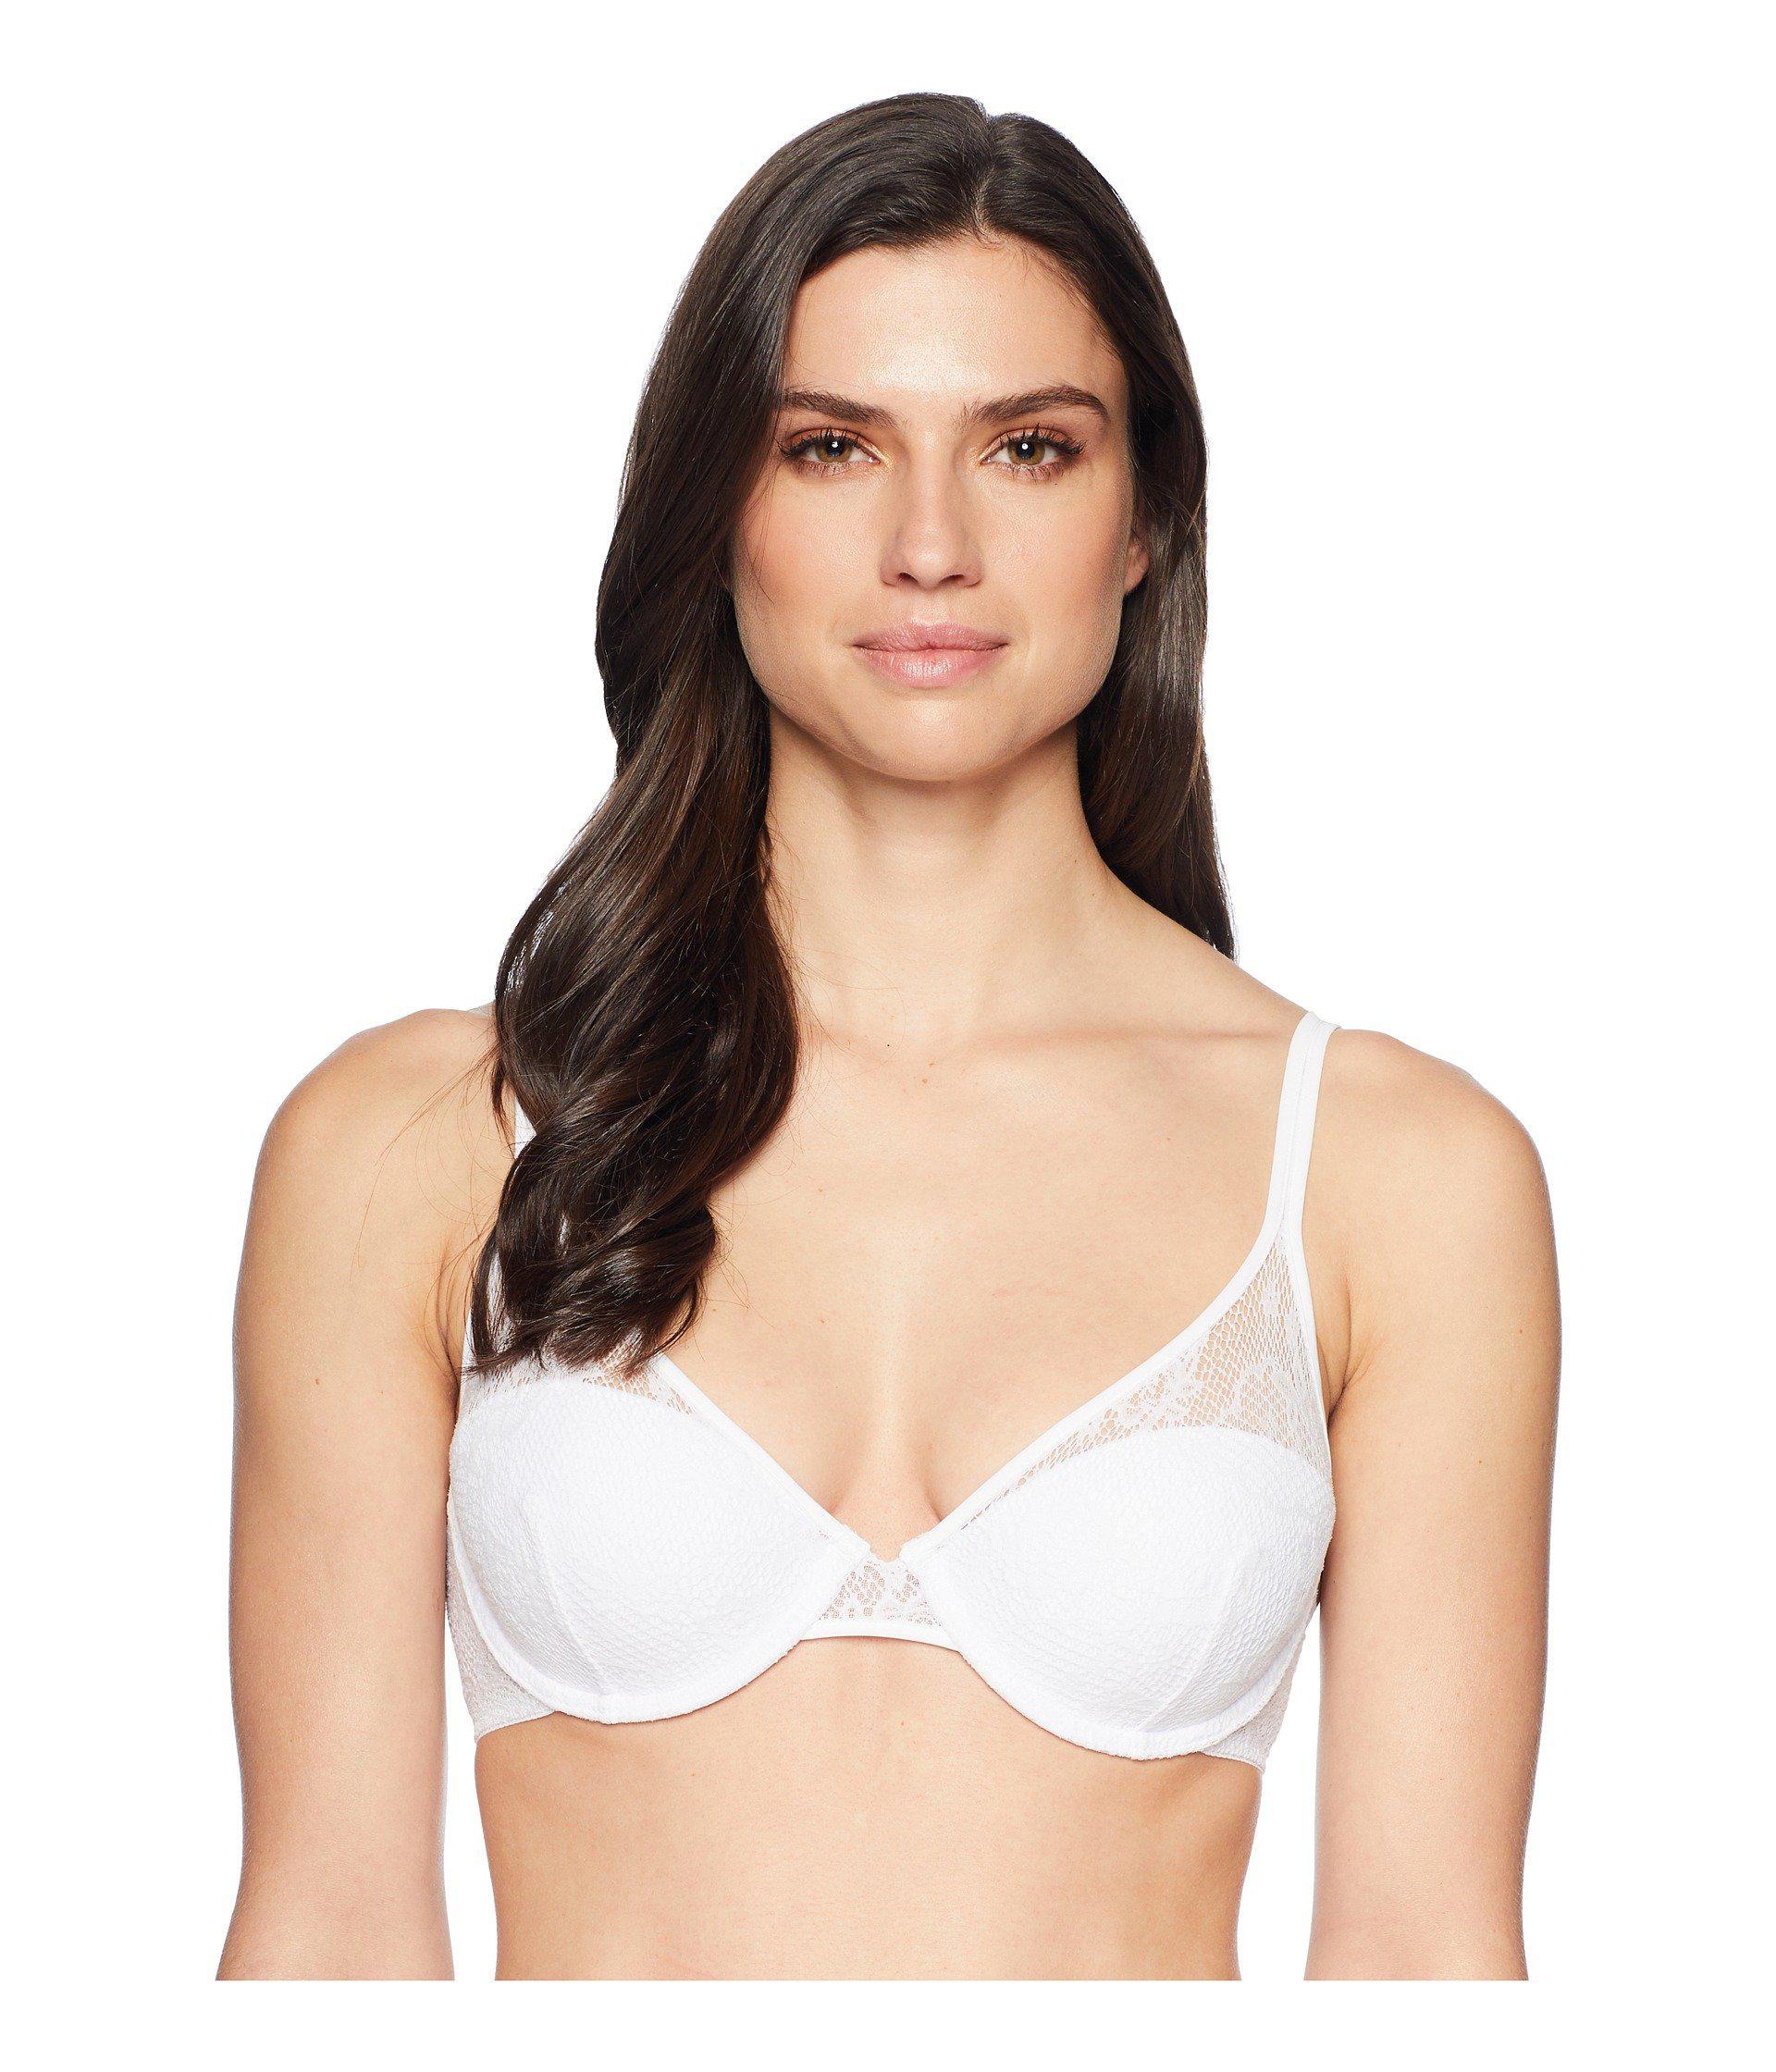 651822493c2 Lyst - On Gossamer Racy Lace Demi Bra G3160 in White - Save 13%